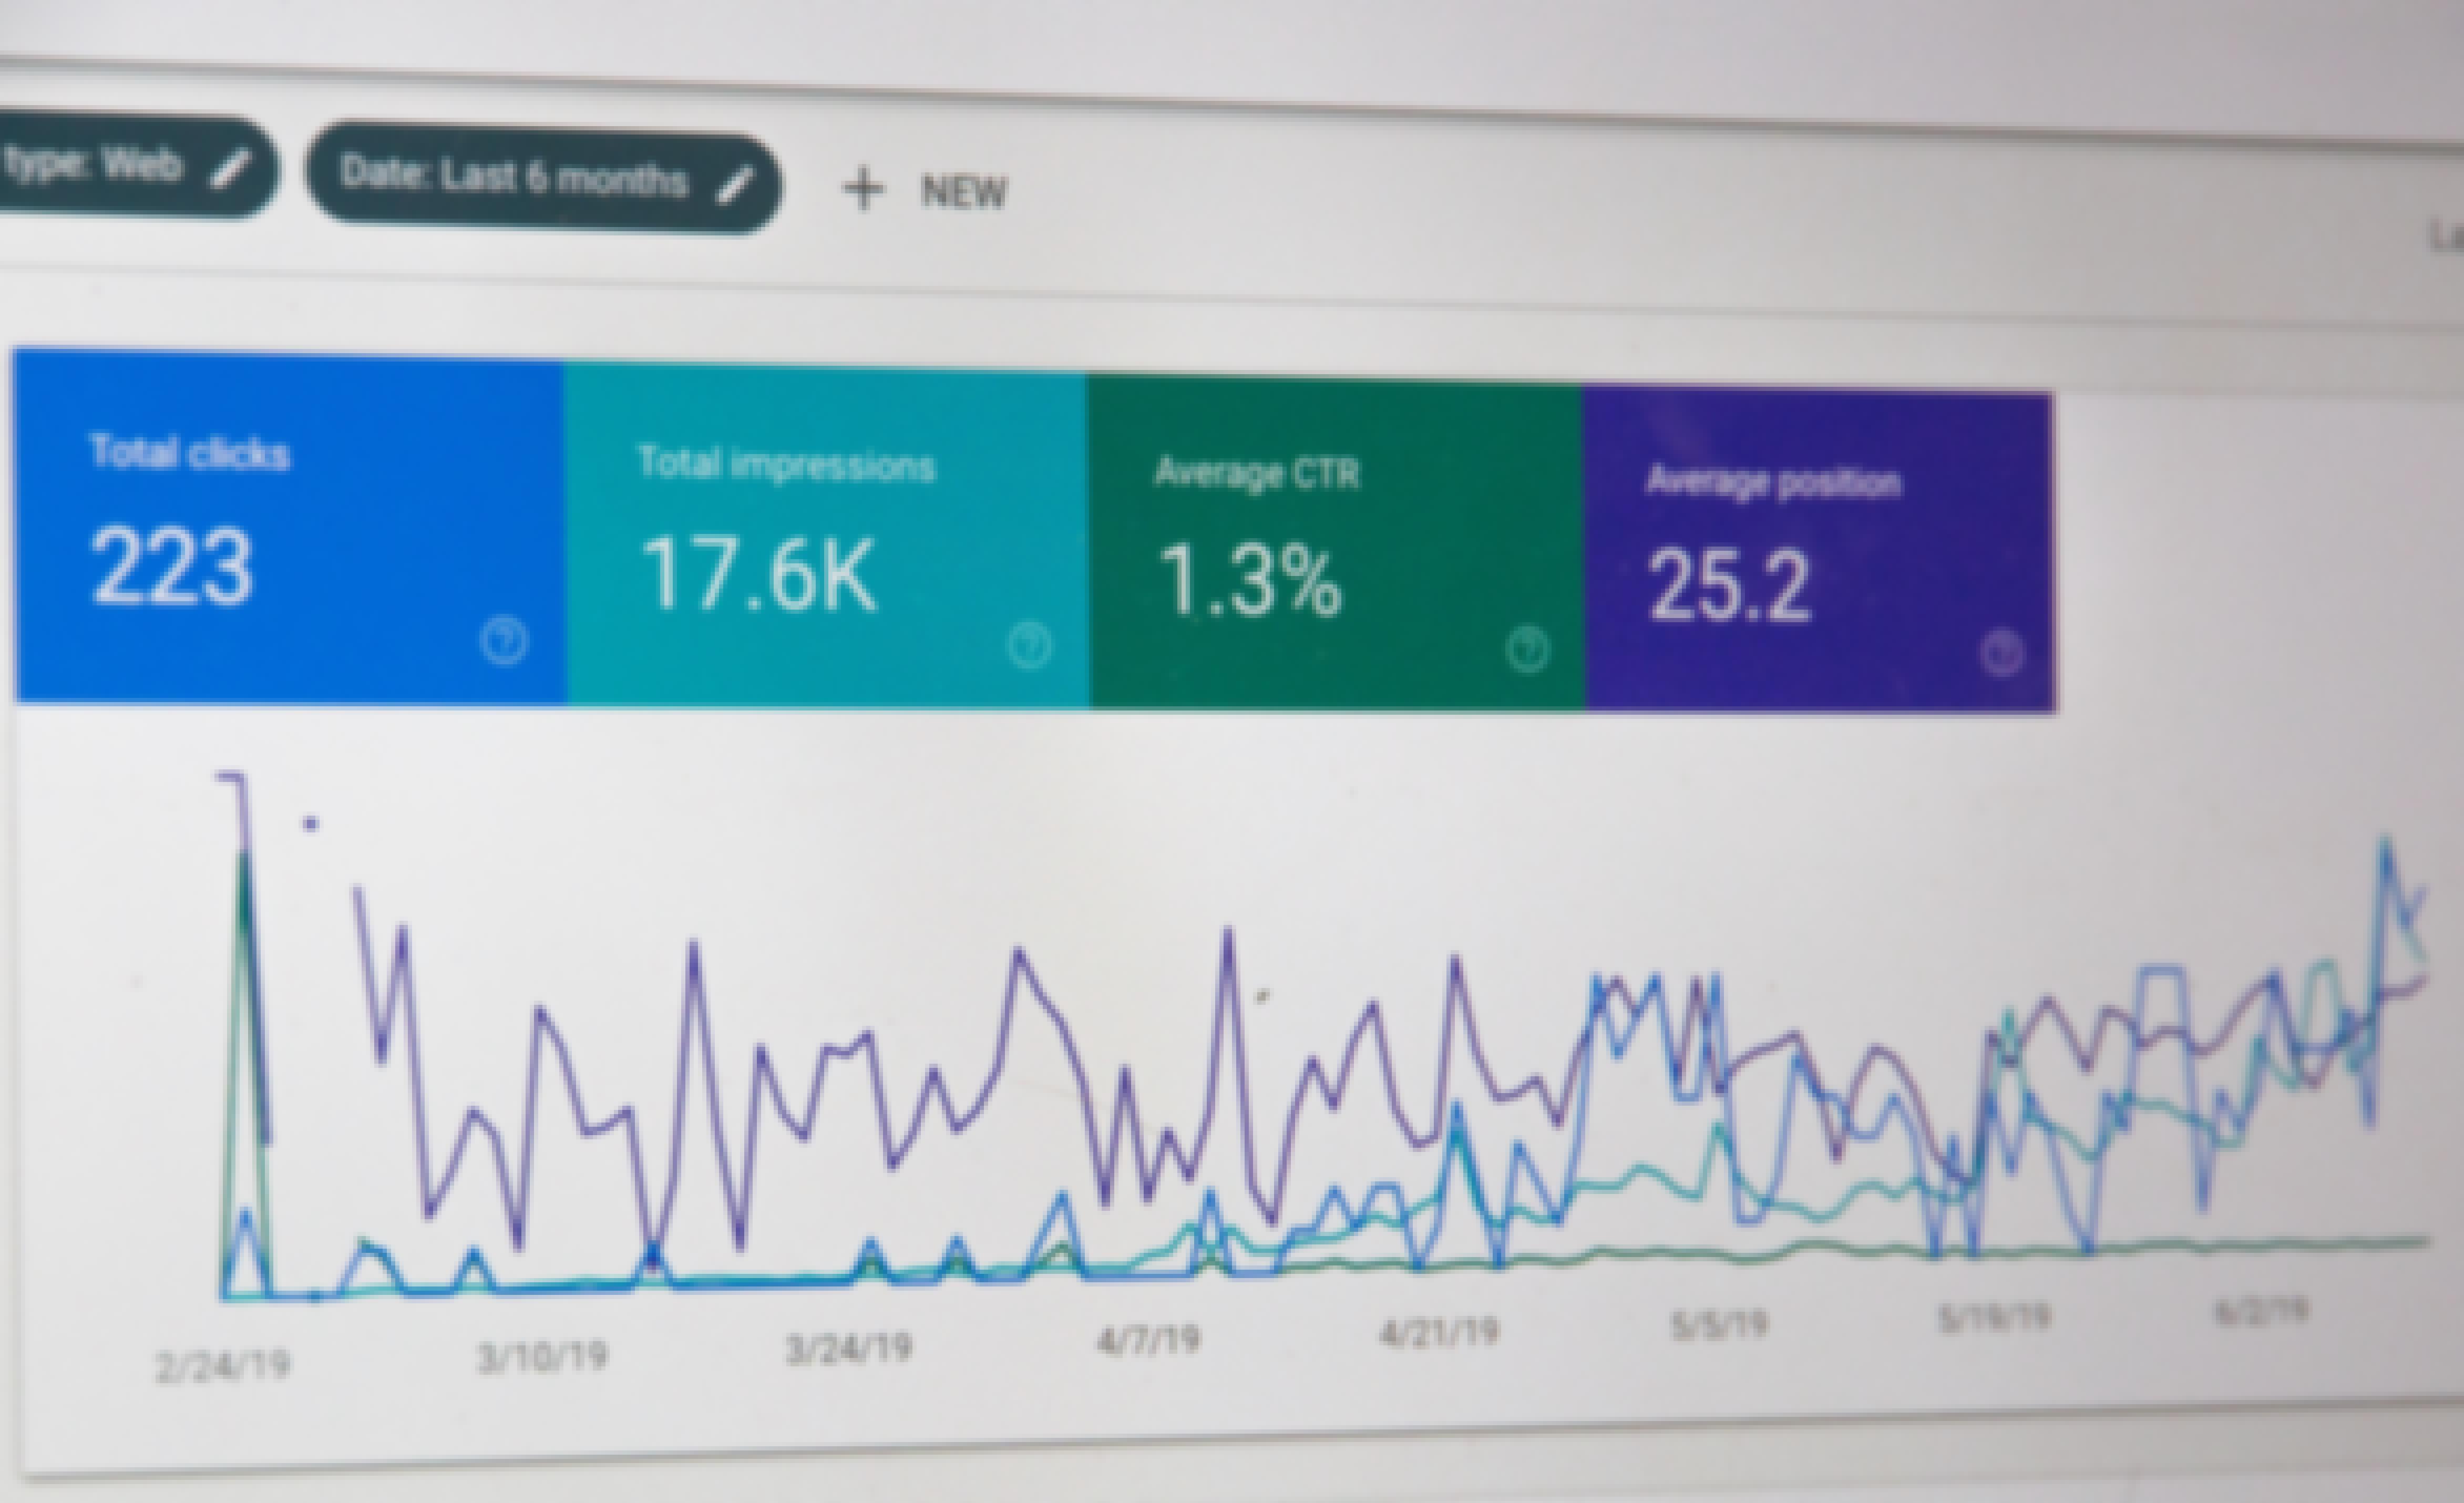 A computer monitor close-up of Google Analytics